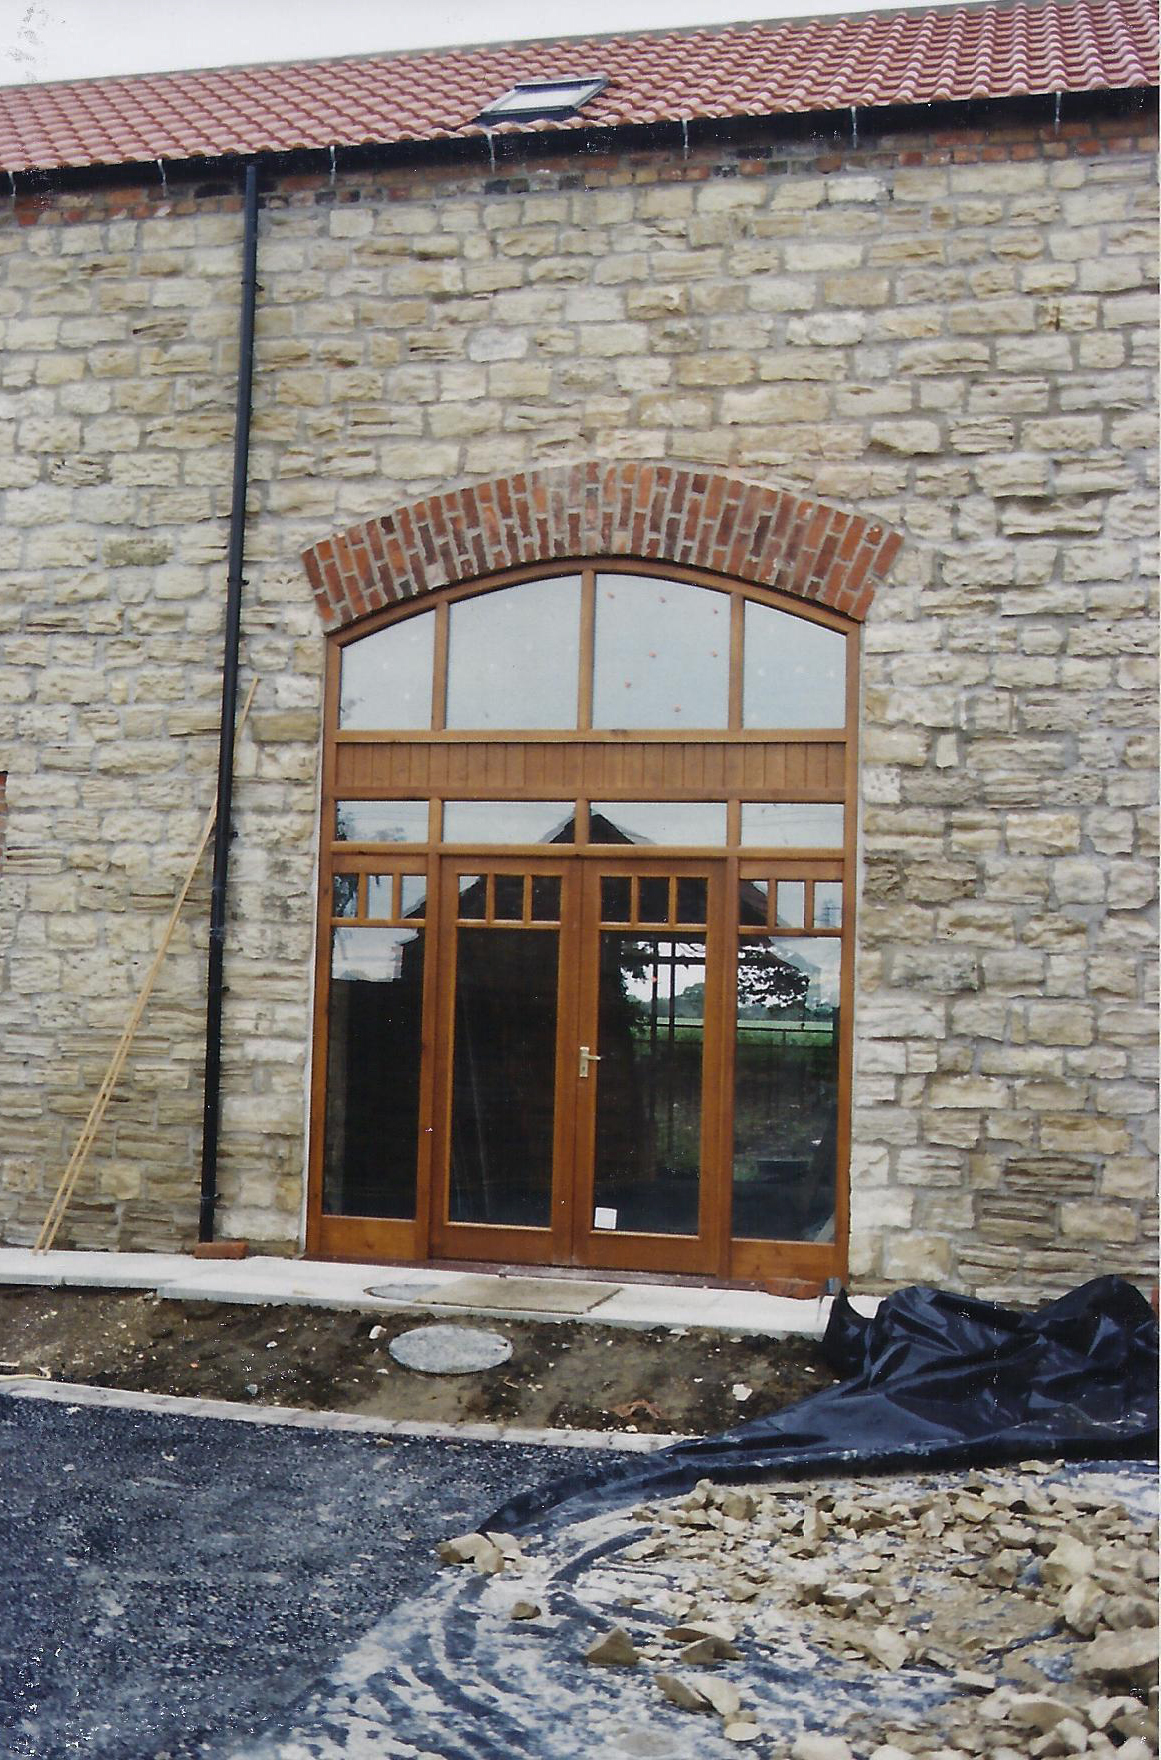 Brecks Farm Construction 8 - East Yorkshire Architects - Samuel Kendall Associates.jpg